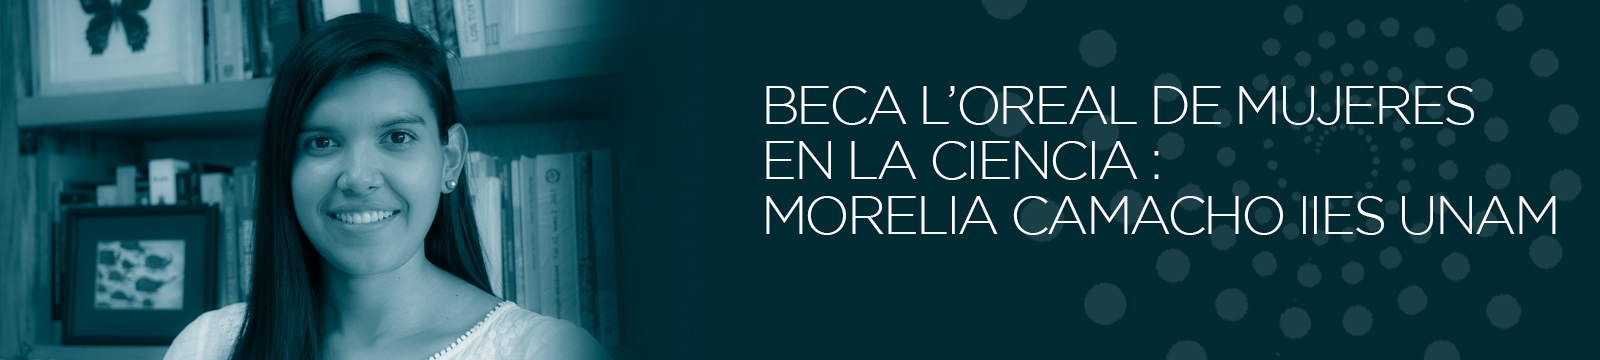 Premio MOrelia Camacho L'oreal 2016